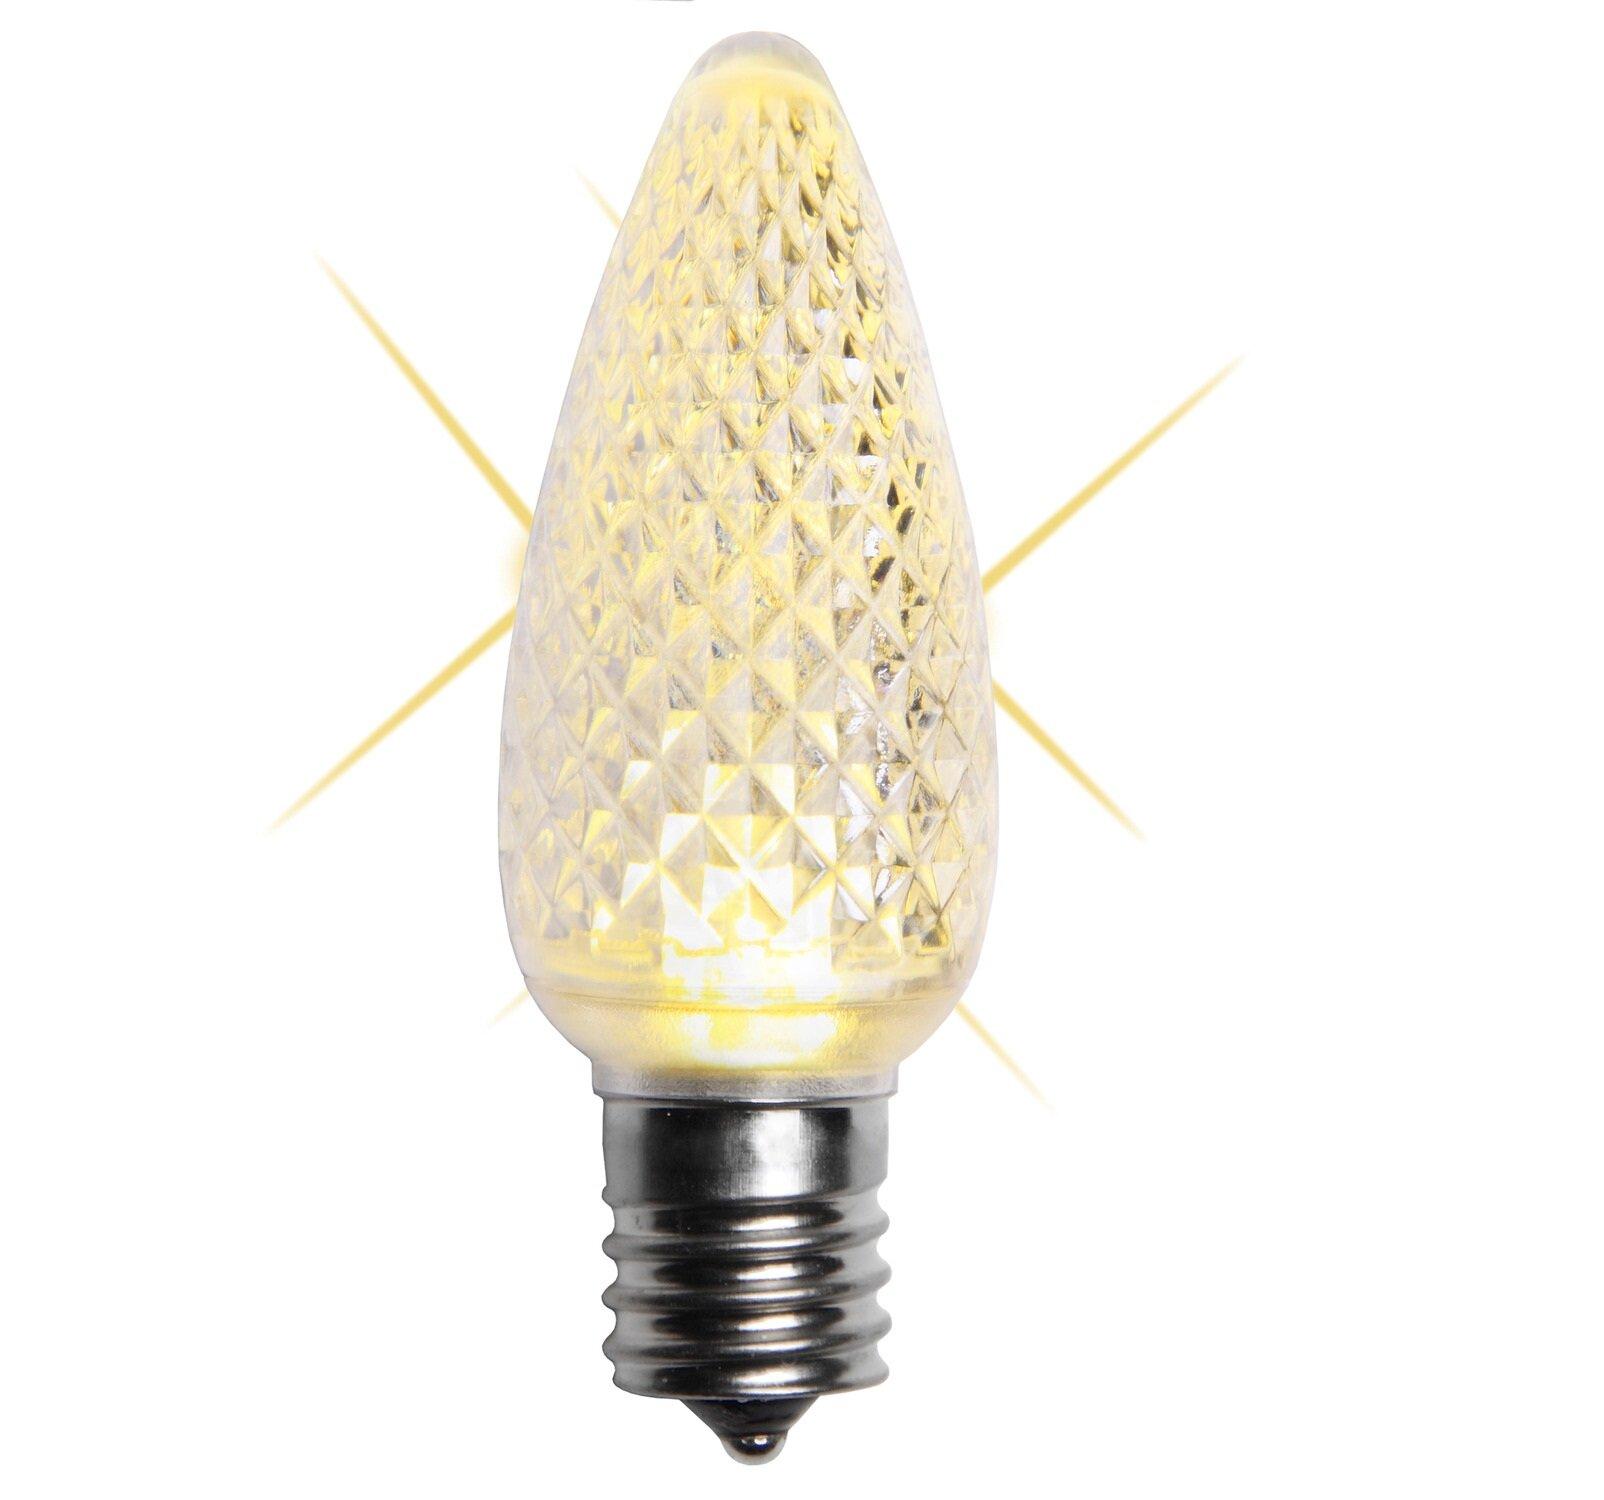 Amber Title 24 Compliant Light Bulbs You Ll Love In 2021 Wayfair